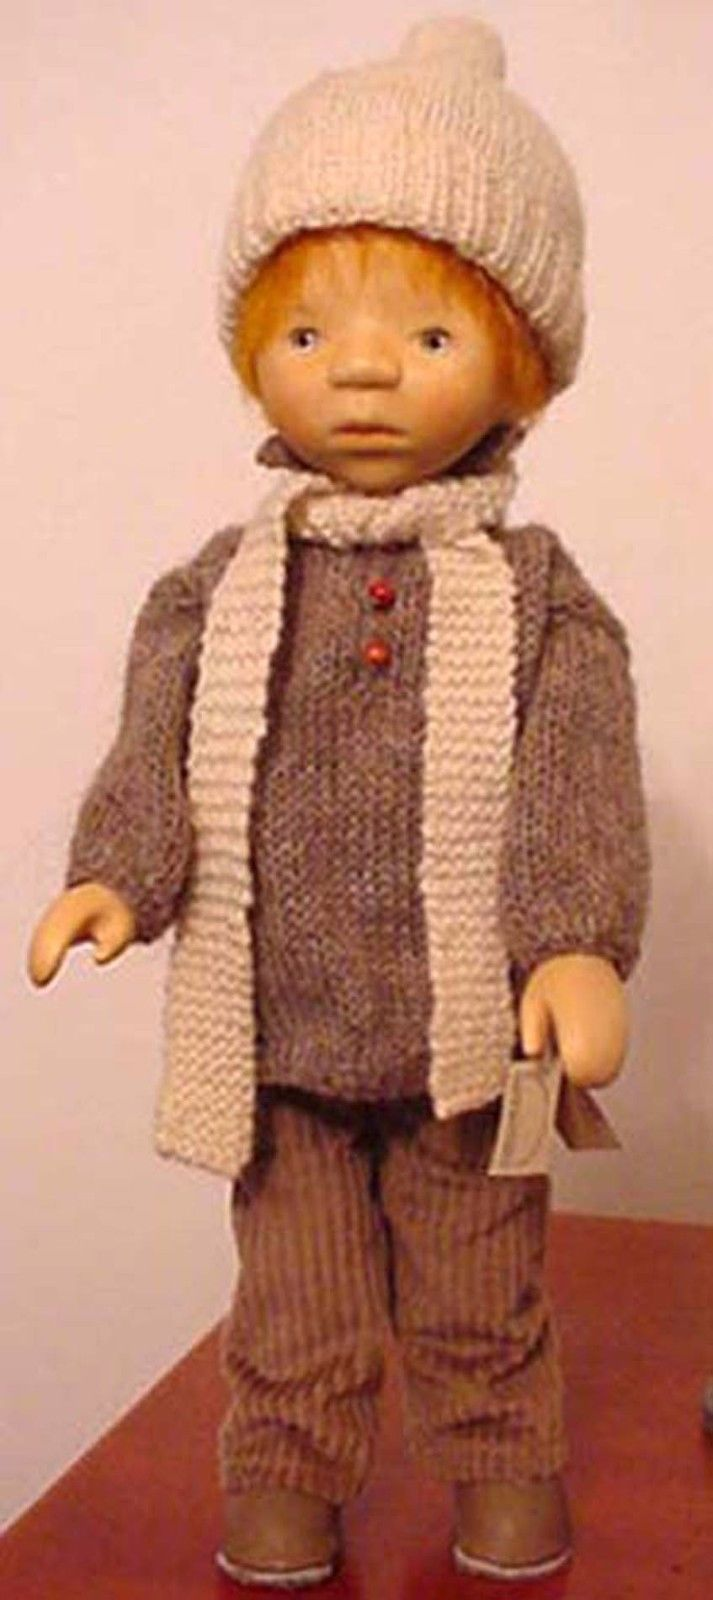 RARE Wooden Boy Doll by Elisabeth Pongratz Germany | eBay